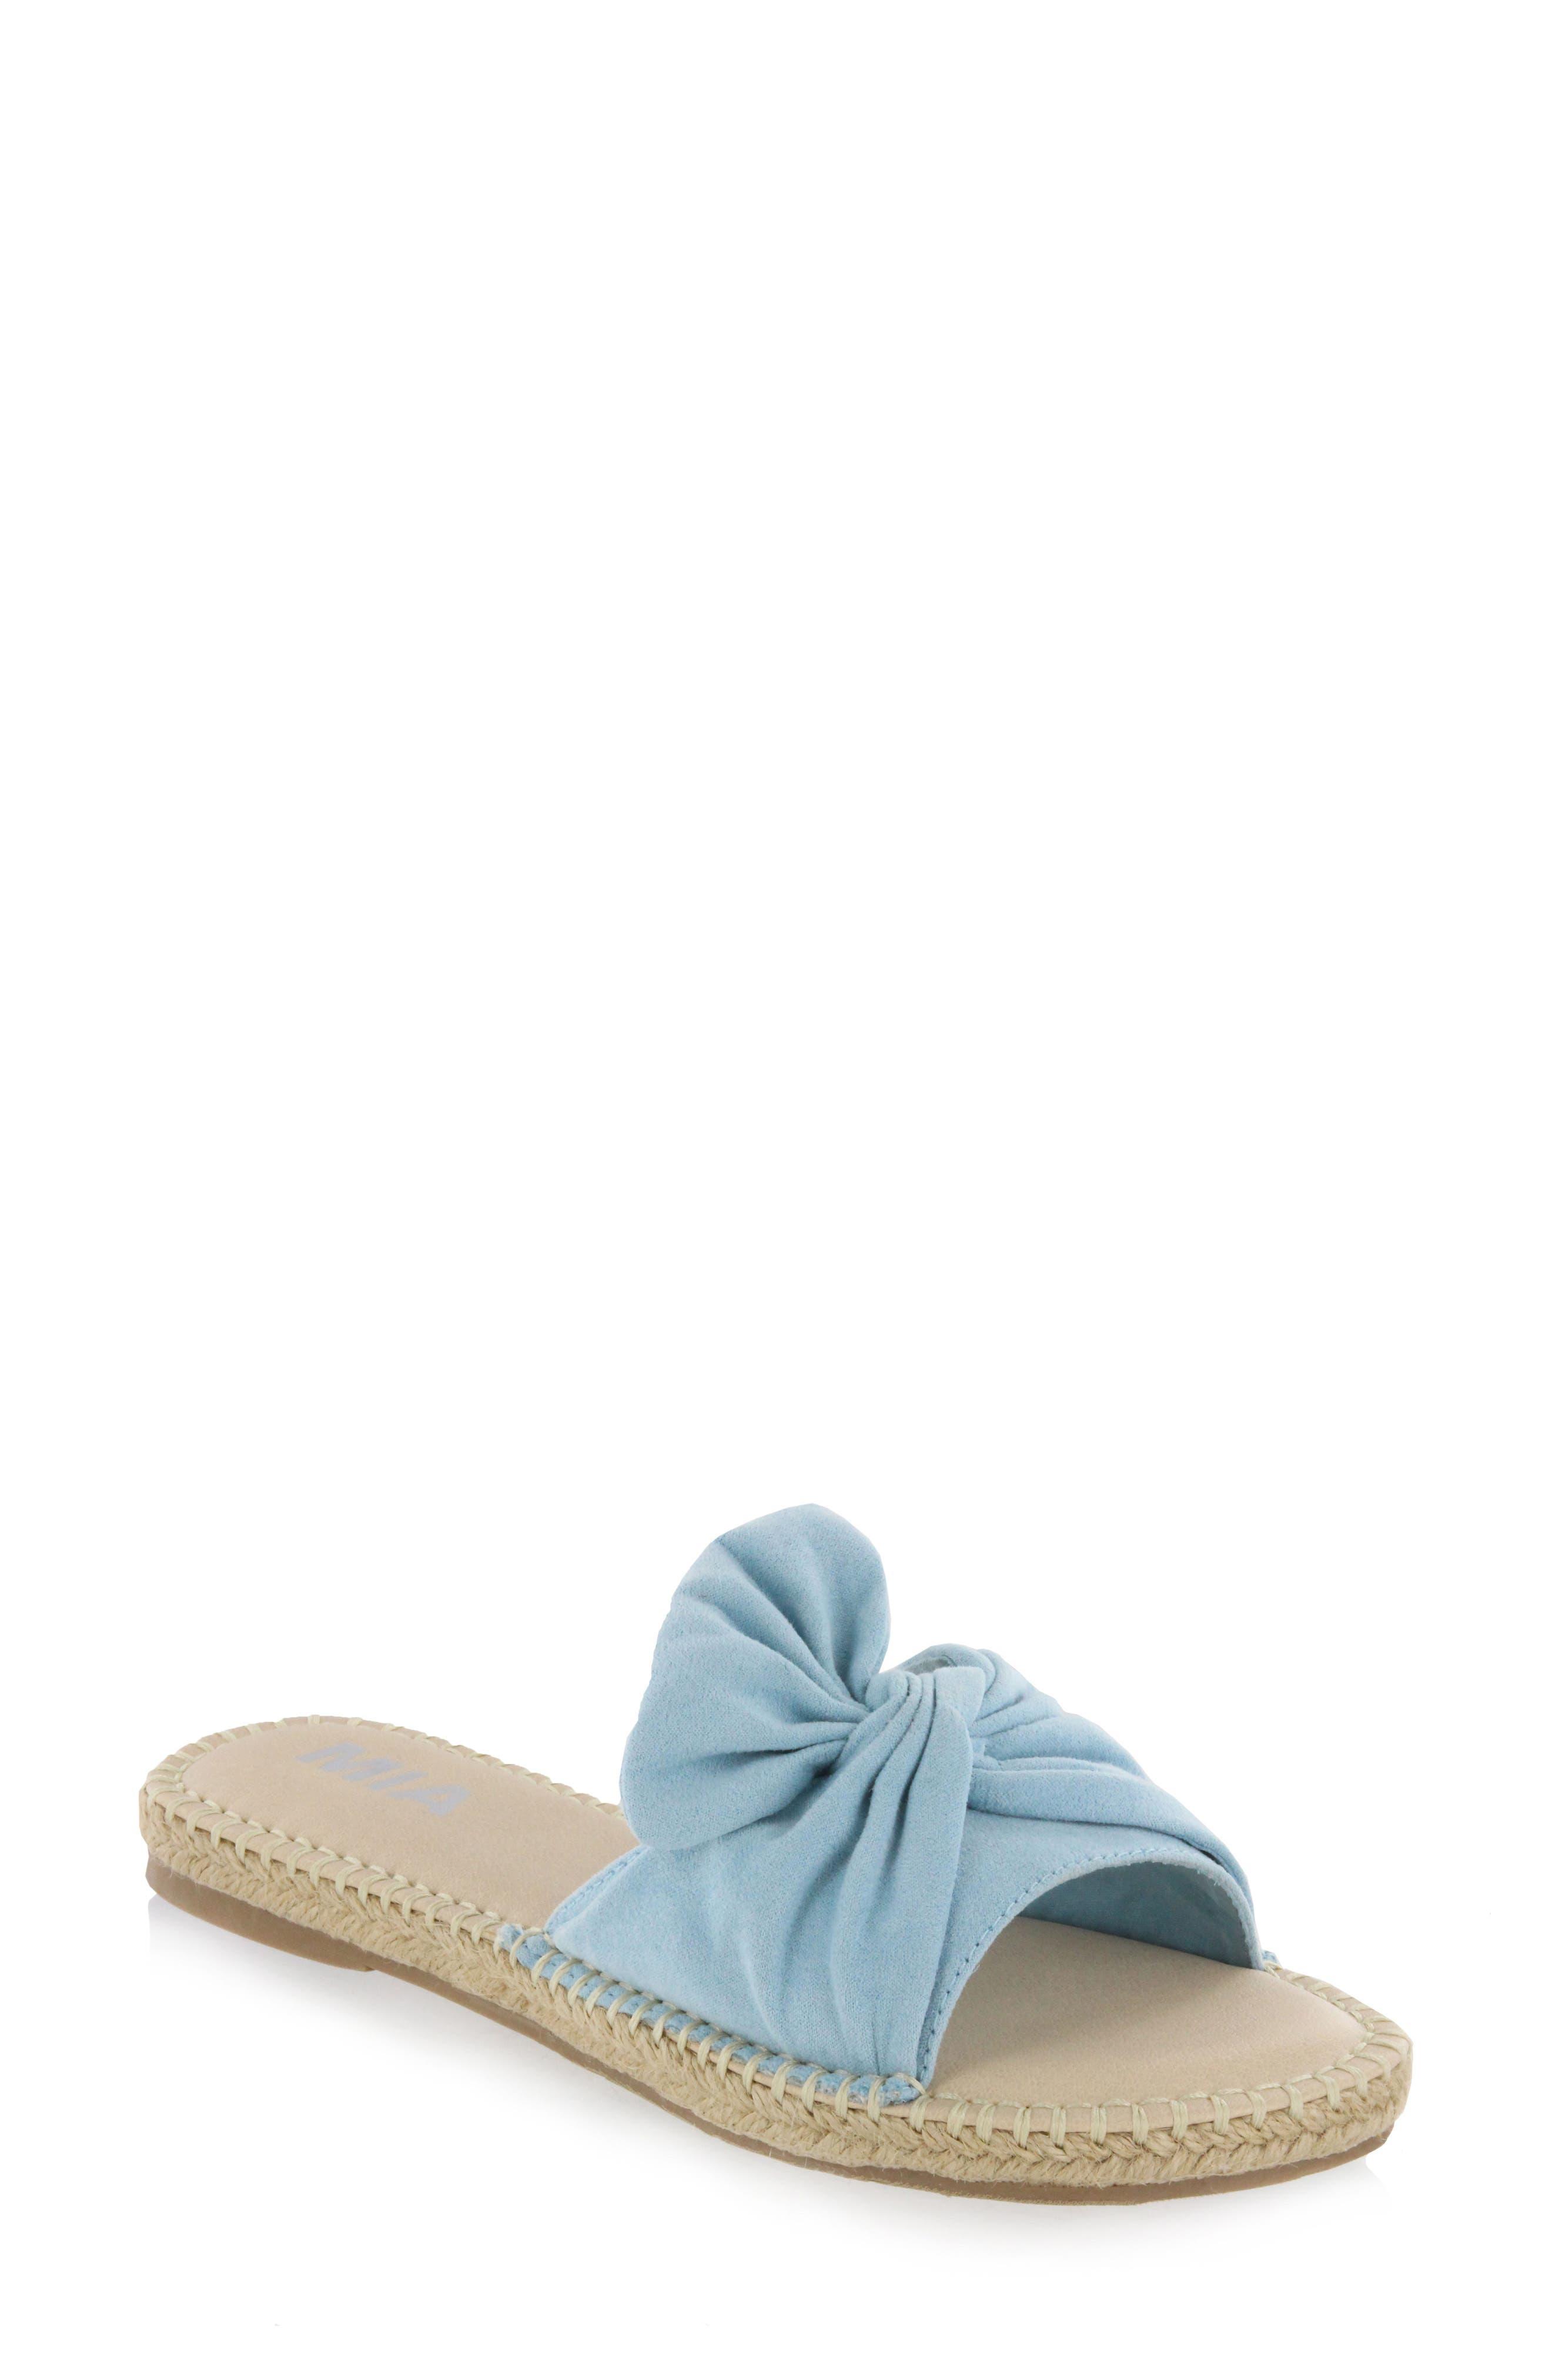 Alternate Image 1 Selected - MIA Kensi Knotted Slide Sandal (Women)